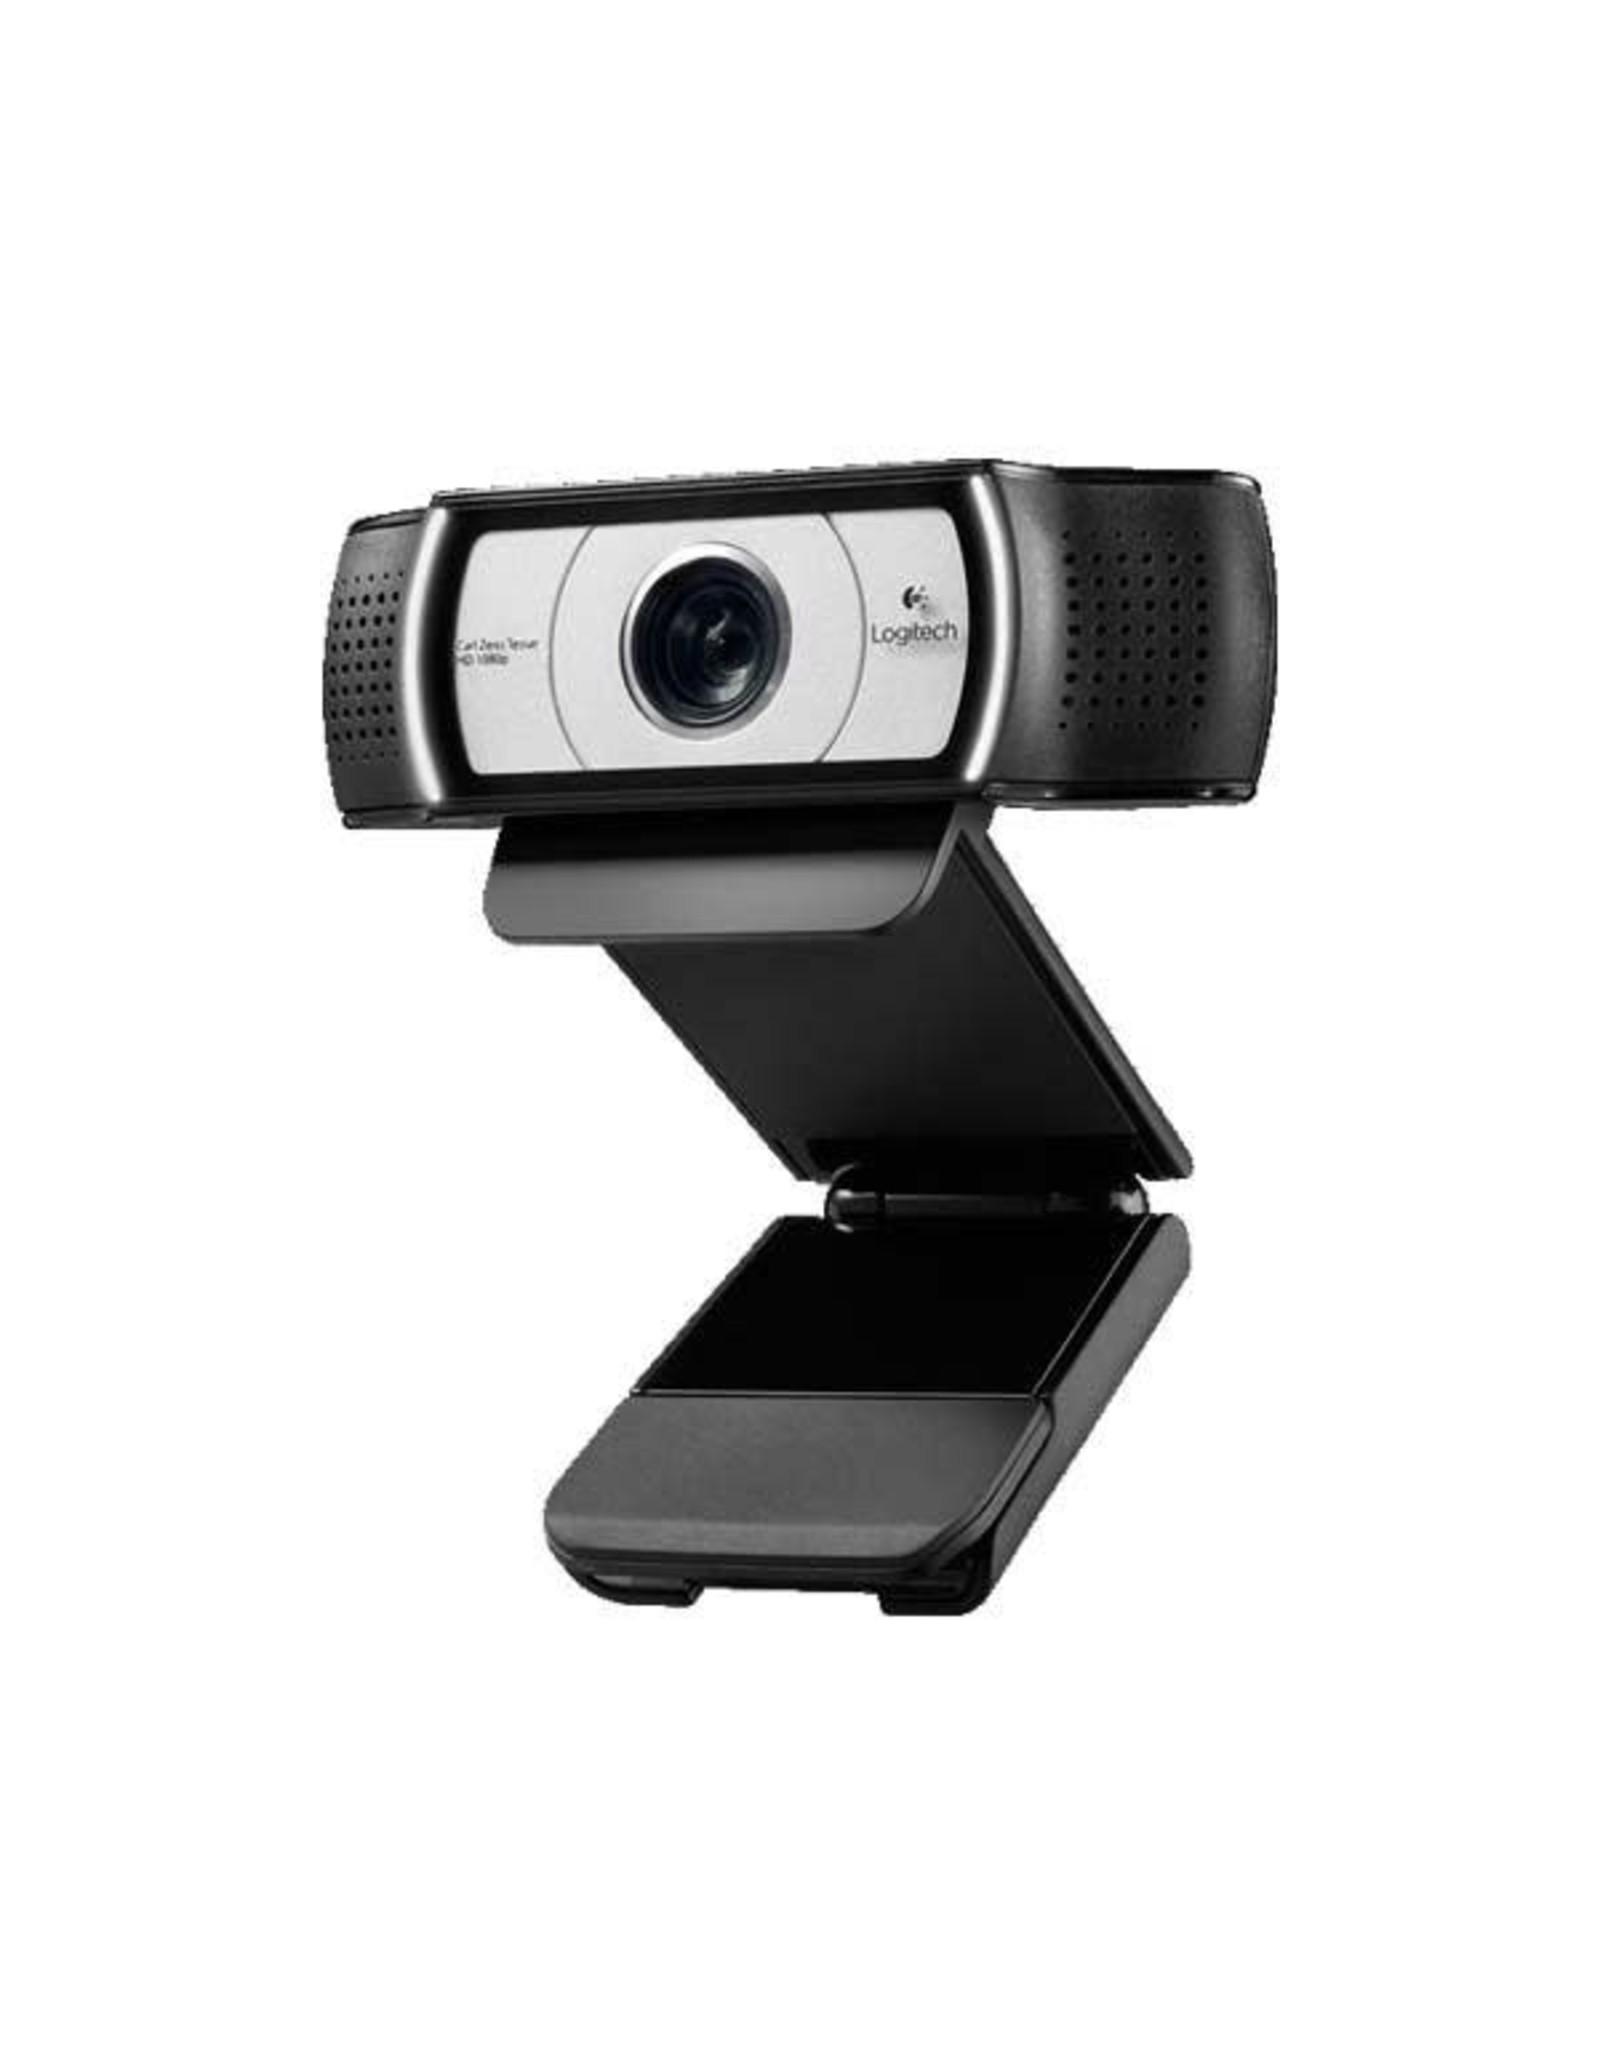 Logitech Logitech Webcam Pro Ultra Wide Angle HD